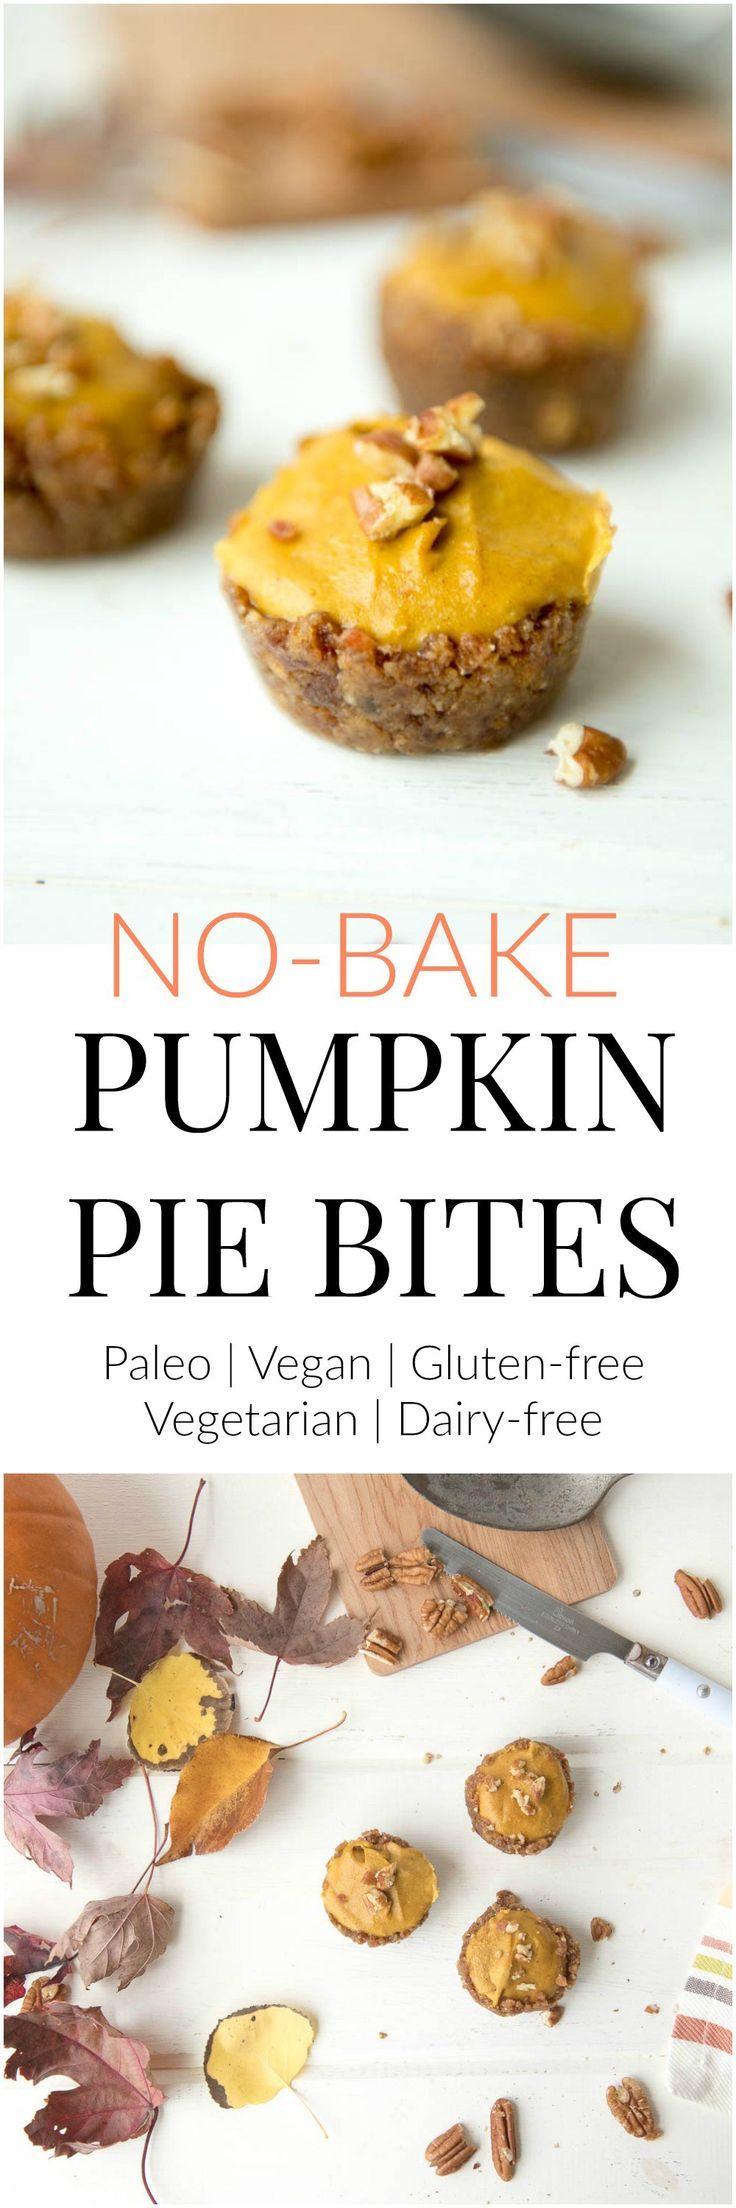 No Bake Pumpkin Pie Bites That Will Make Every Guest Happy Thriving On Paleo Aip Paleo Recipes For Autoimmune Disease Relief Recipe Baked Pumpkin Pie Bites Recipe No